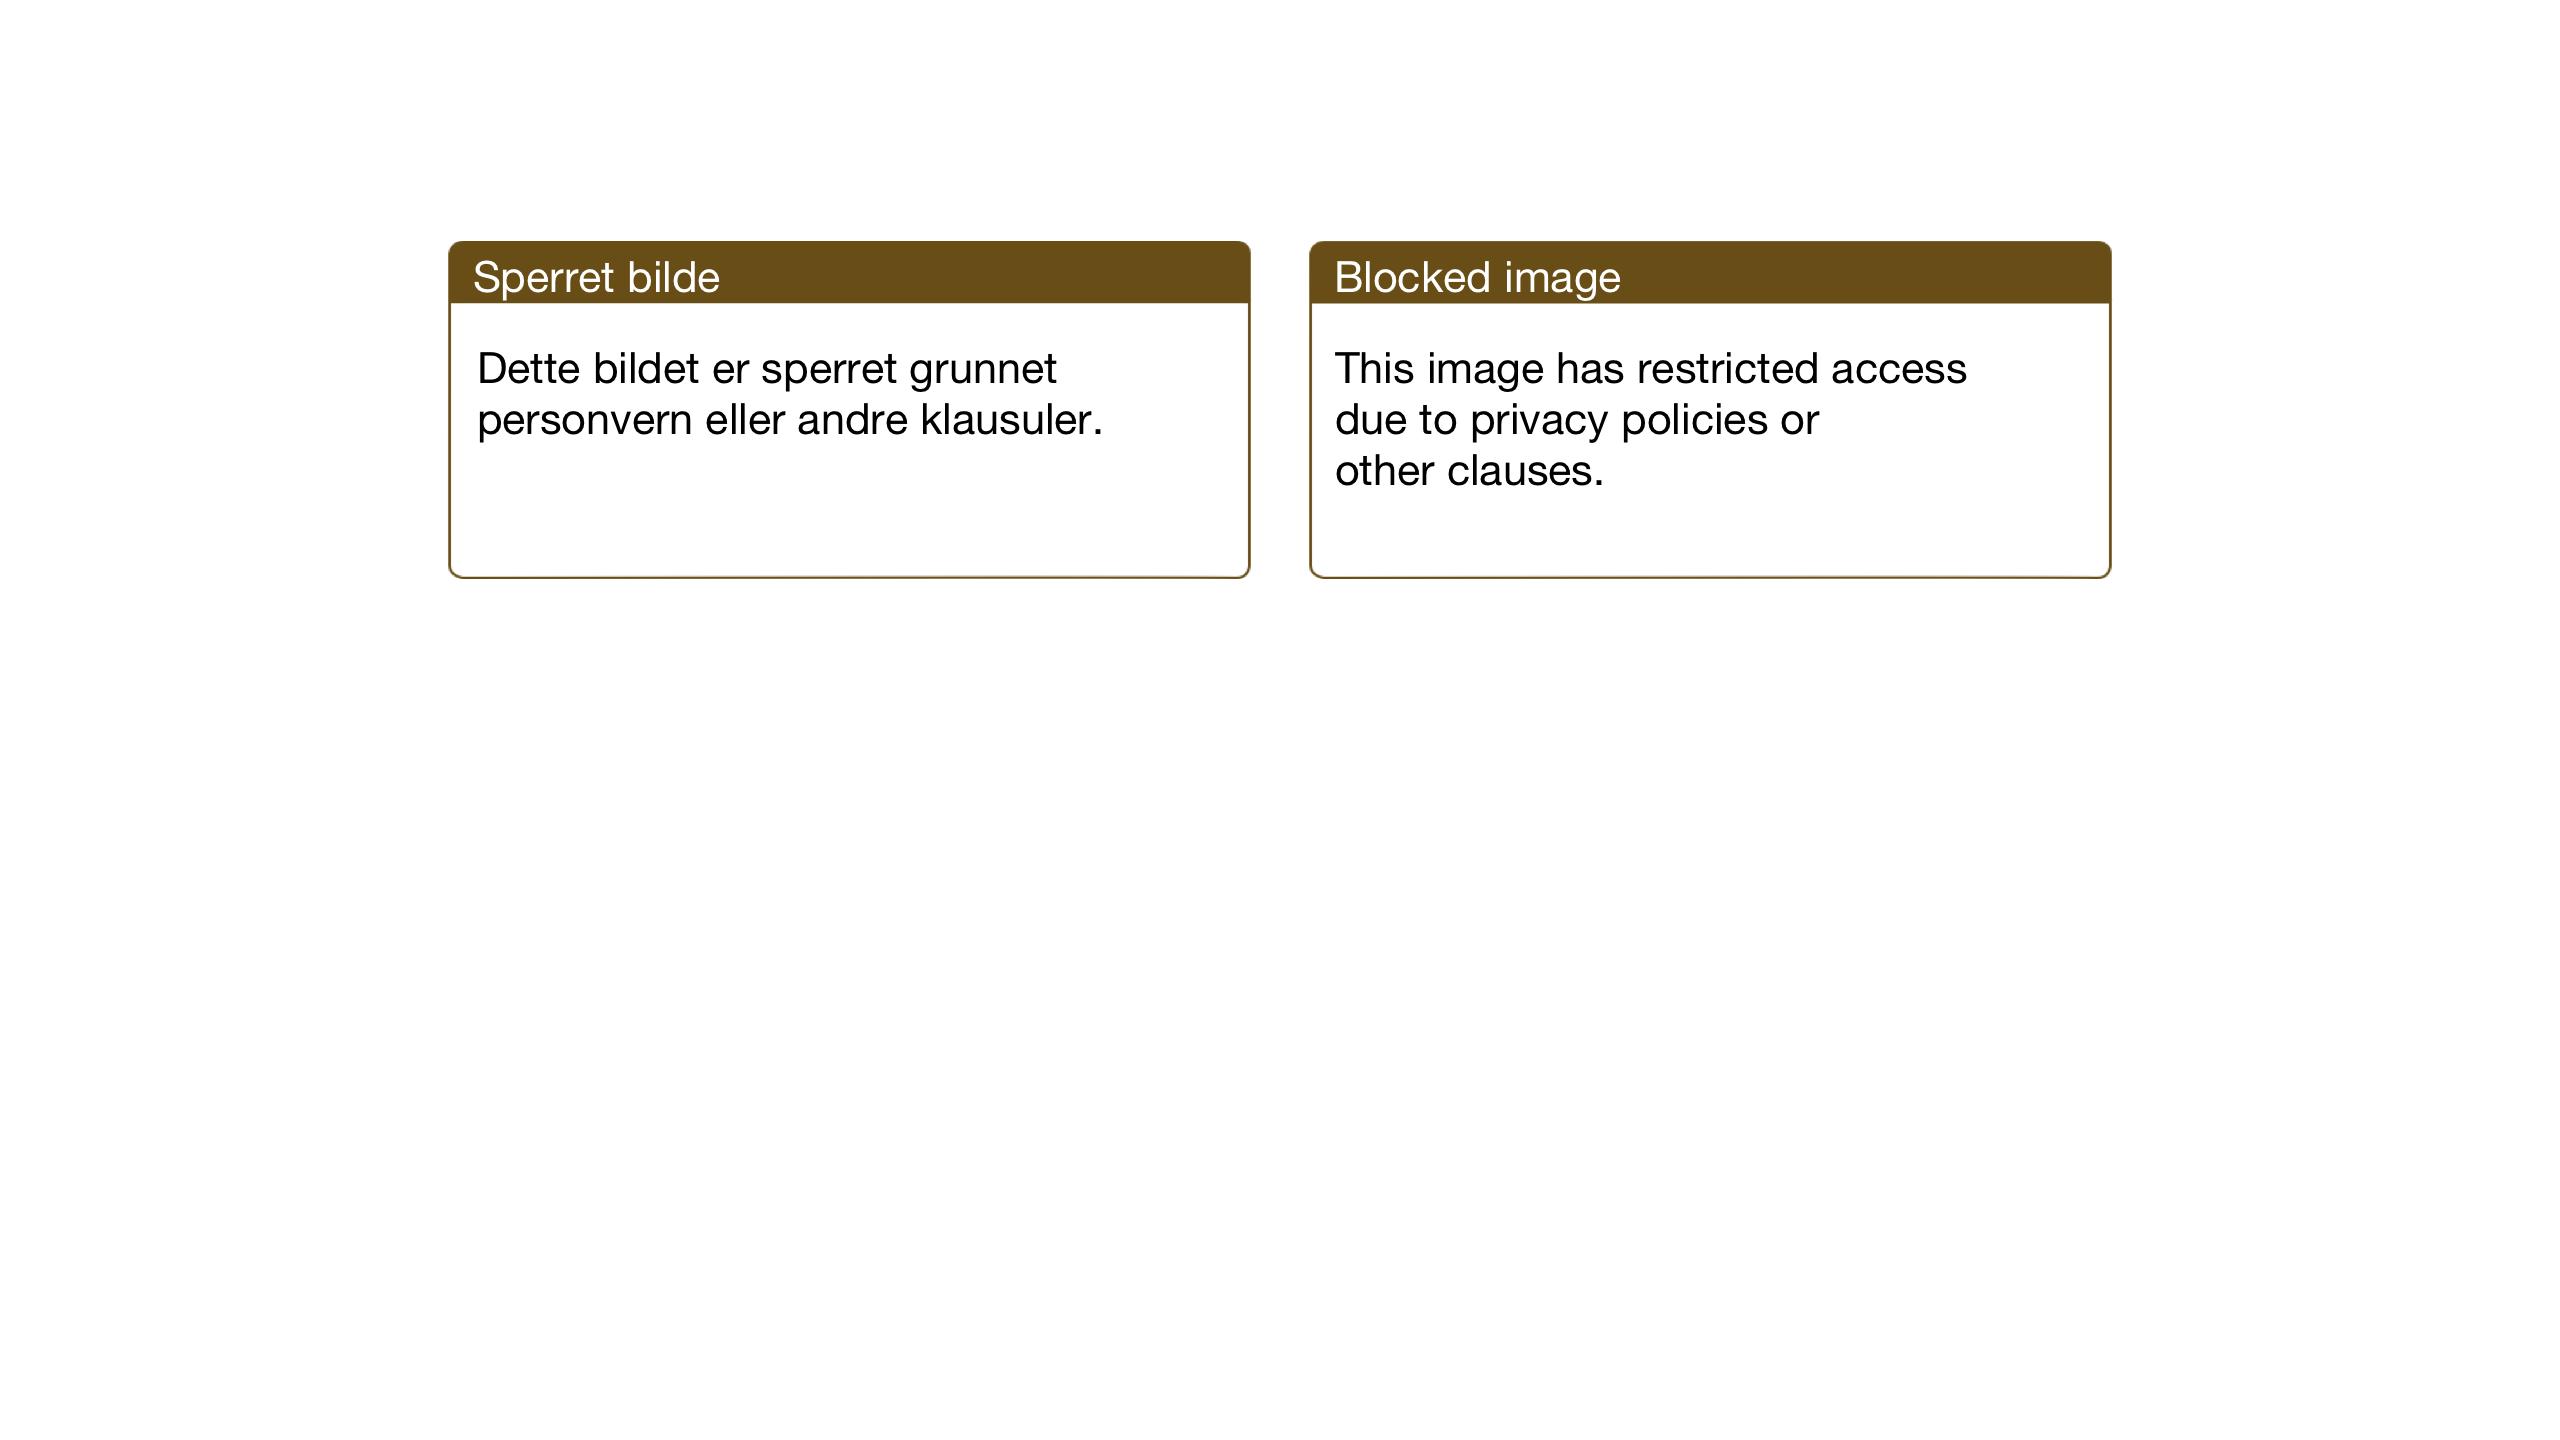 SAT, Ministerialprotokoller, klokkerbøker og fødselsregistre - Nordland, 847/L0680: Klokkerbok nr. 847C08, 1930-1947, s. 96